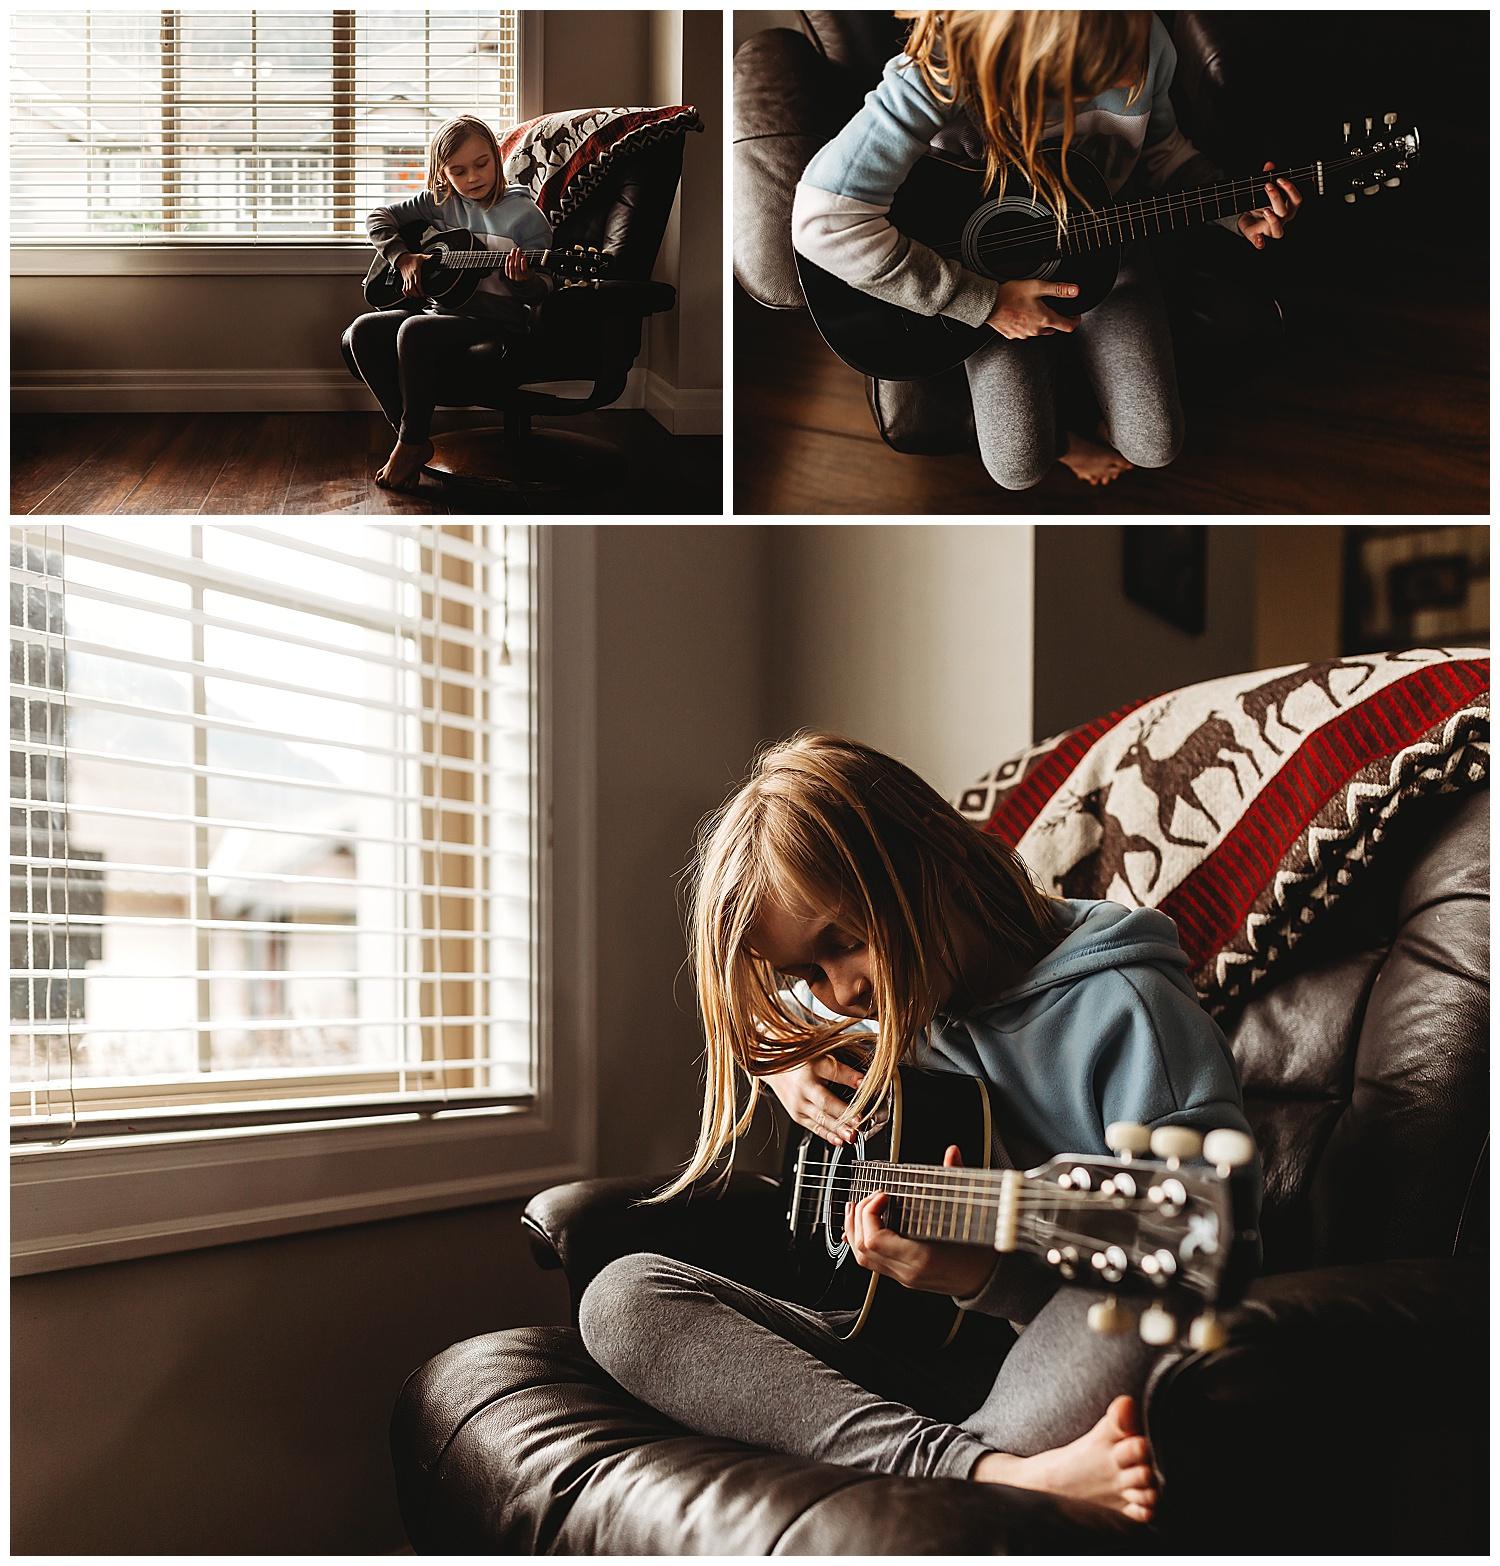 Guitar Anna Hurley Photography Chilliwack 2.jpg